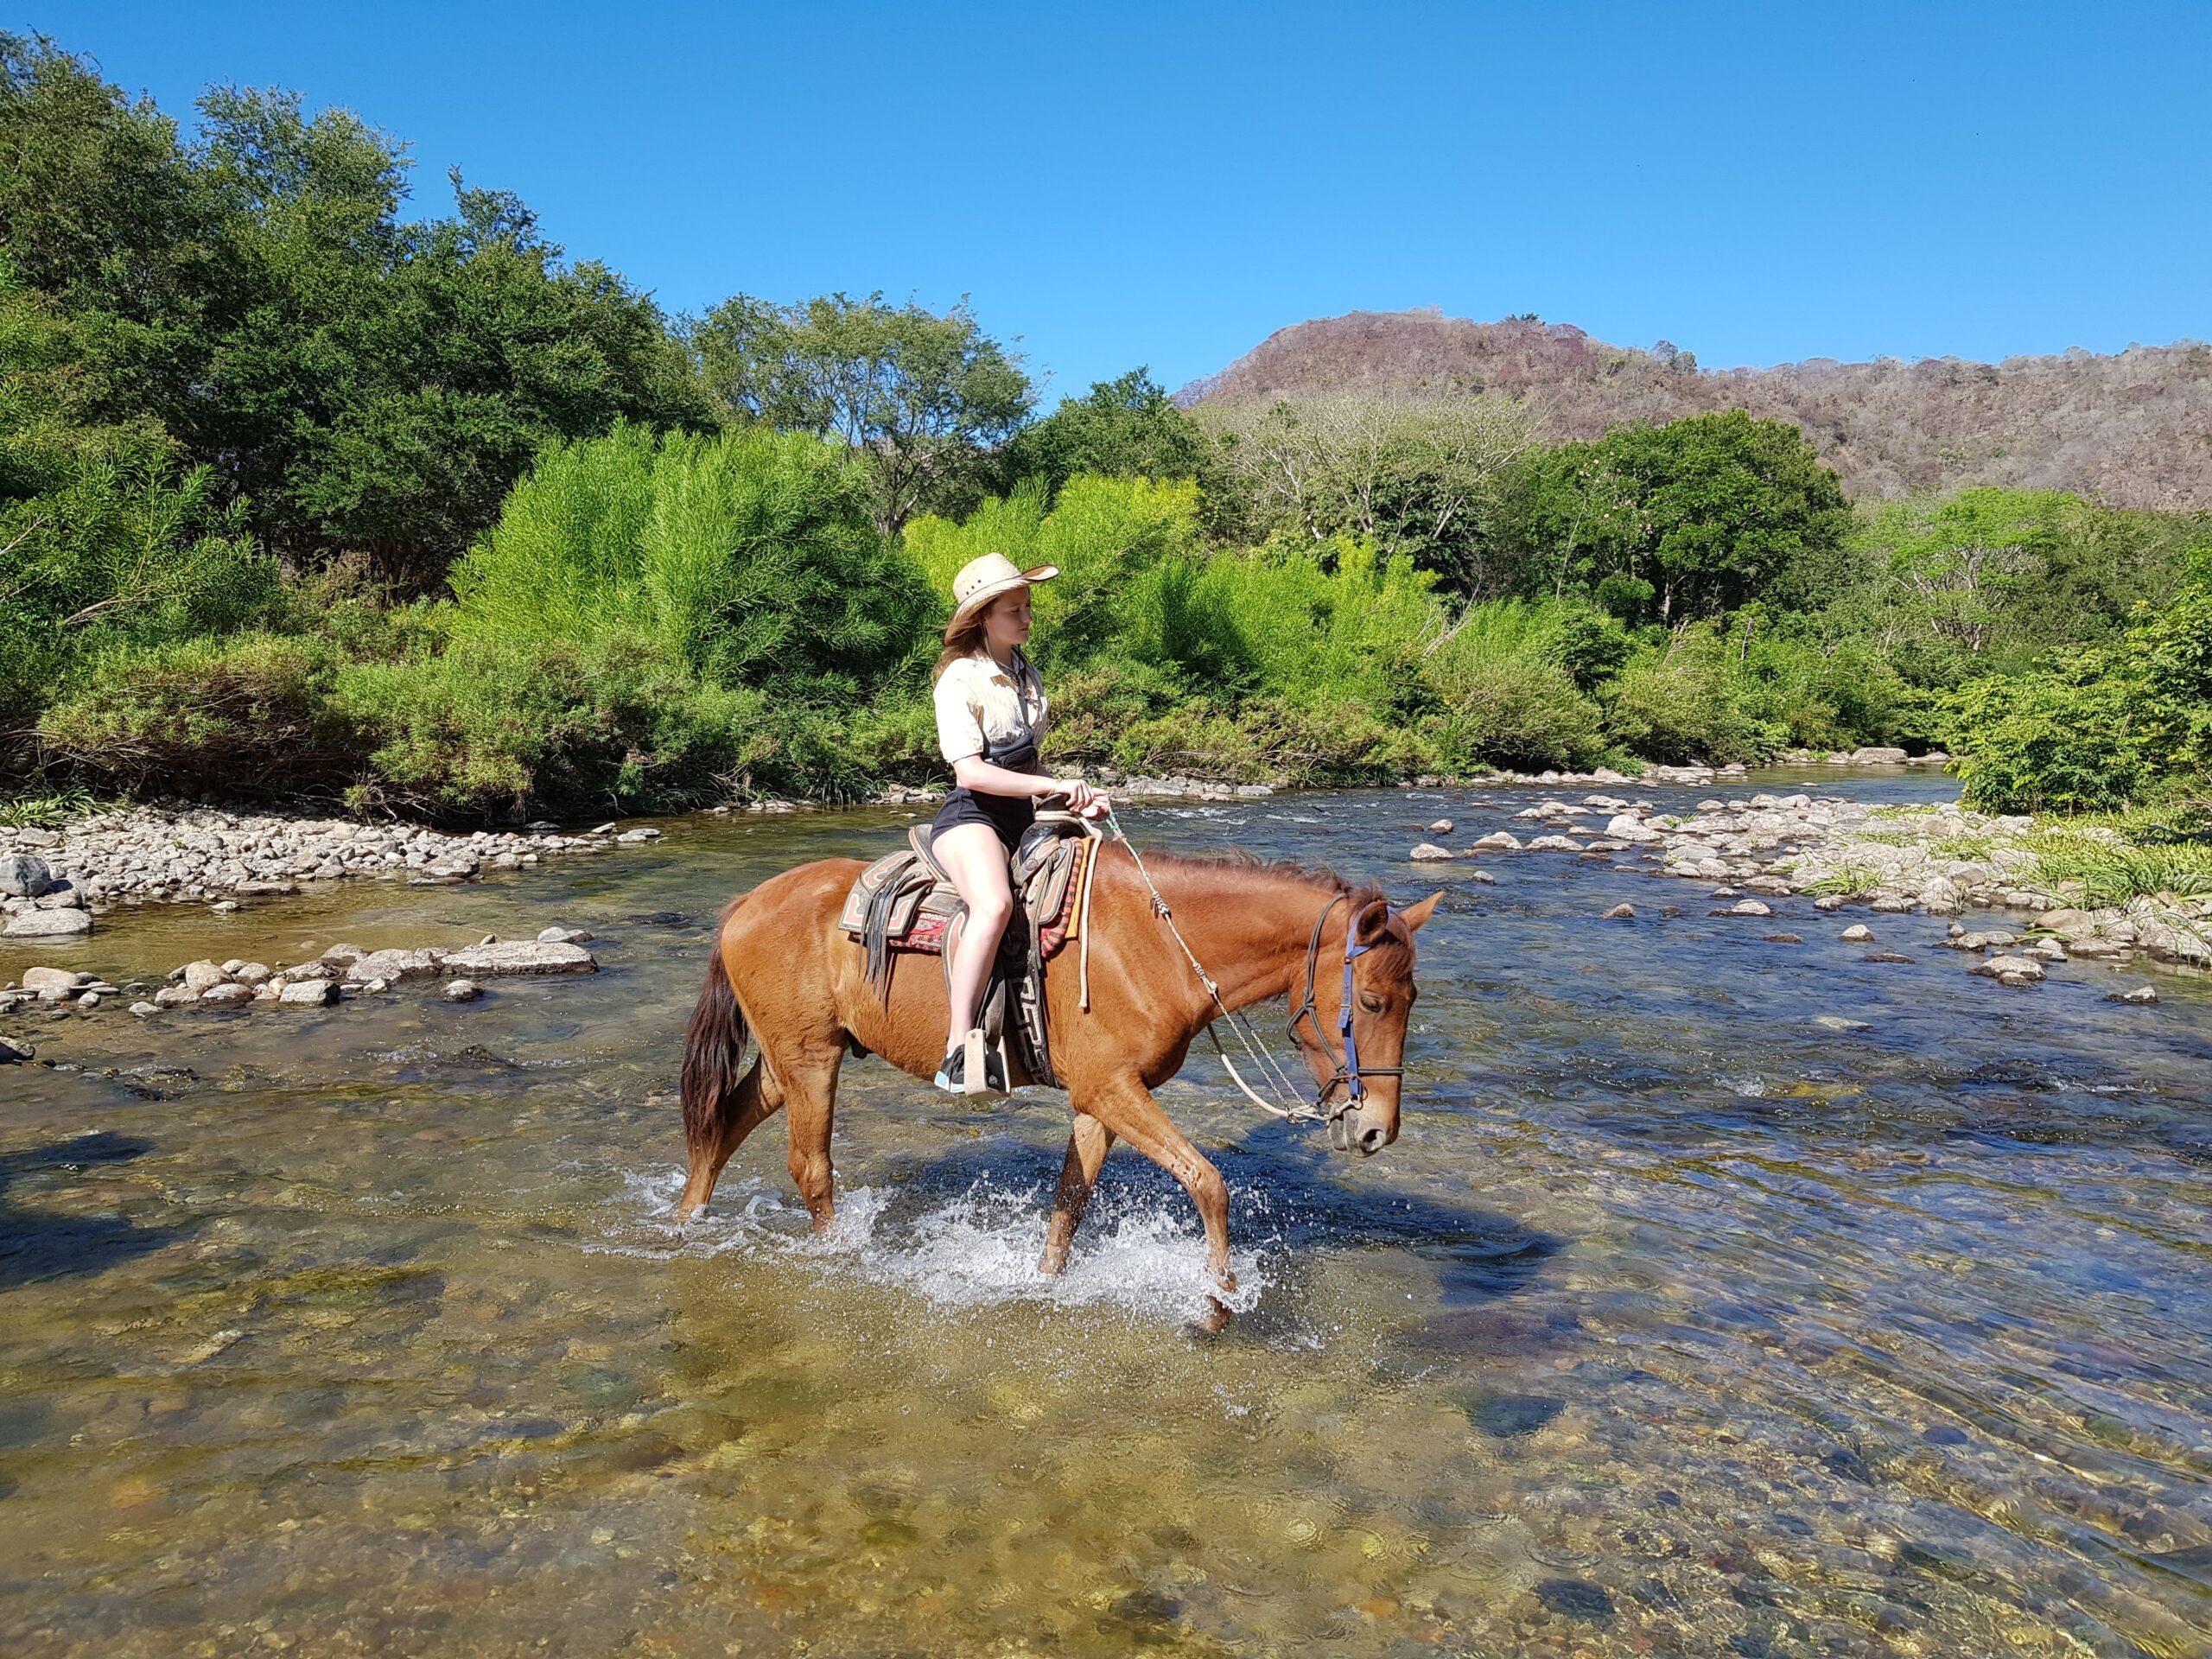 Horseback Riding Adventure Hot Springs Tour From Puerto Escondido 121 Scaled